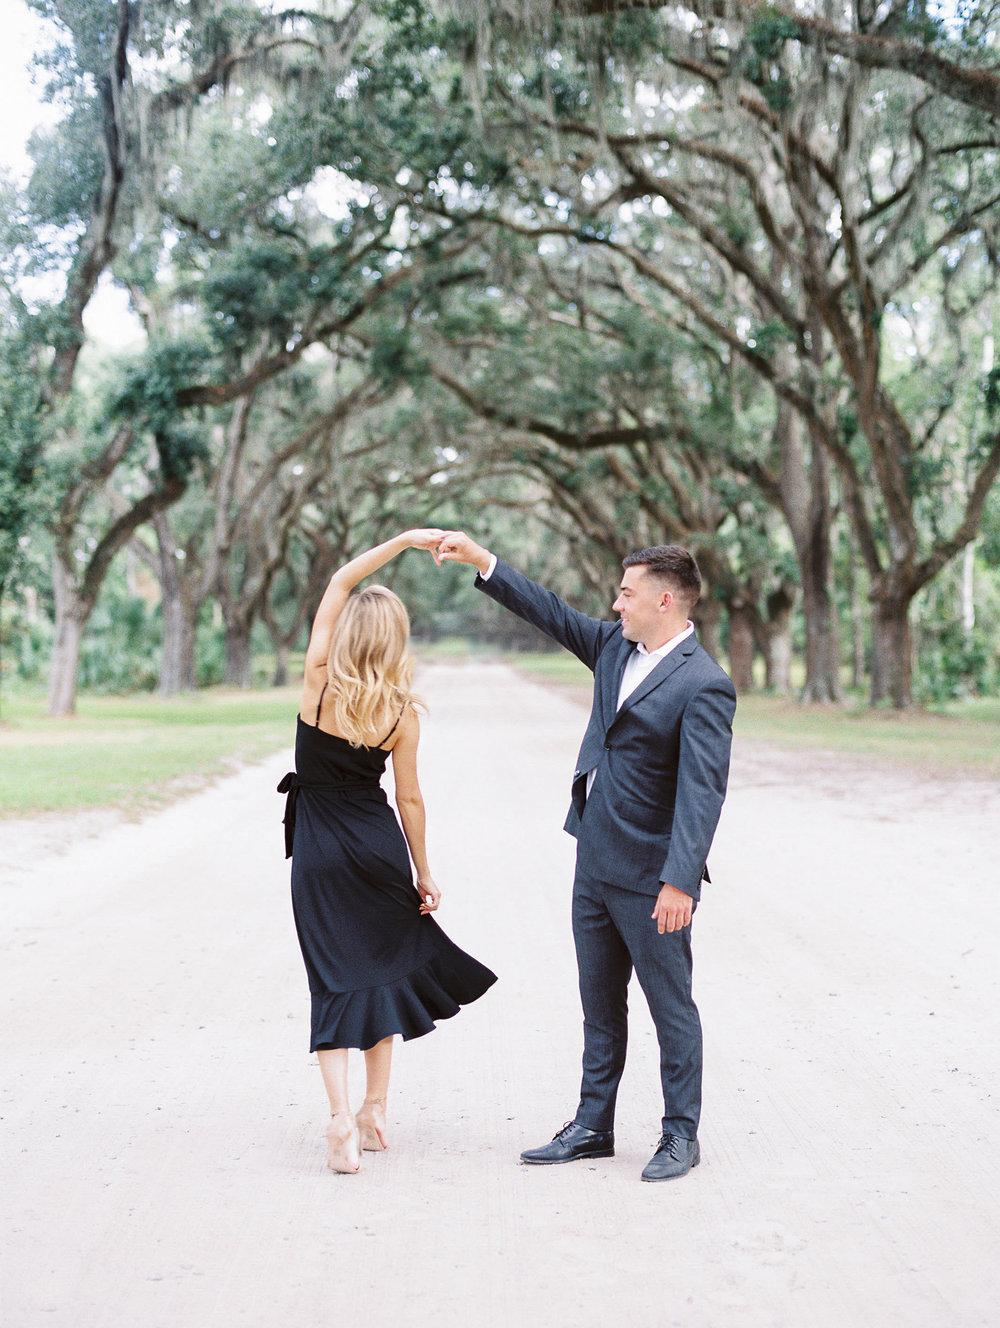 hannah-tommy-wormsloe-historic-site-engagement-photos-hannah-forsberg-atlanta-wedding-photographer-21.jpg